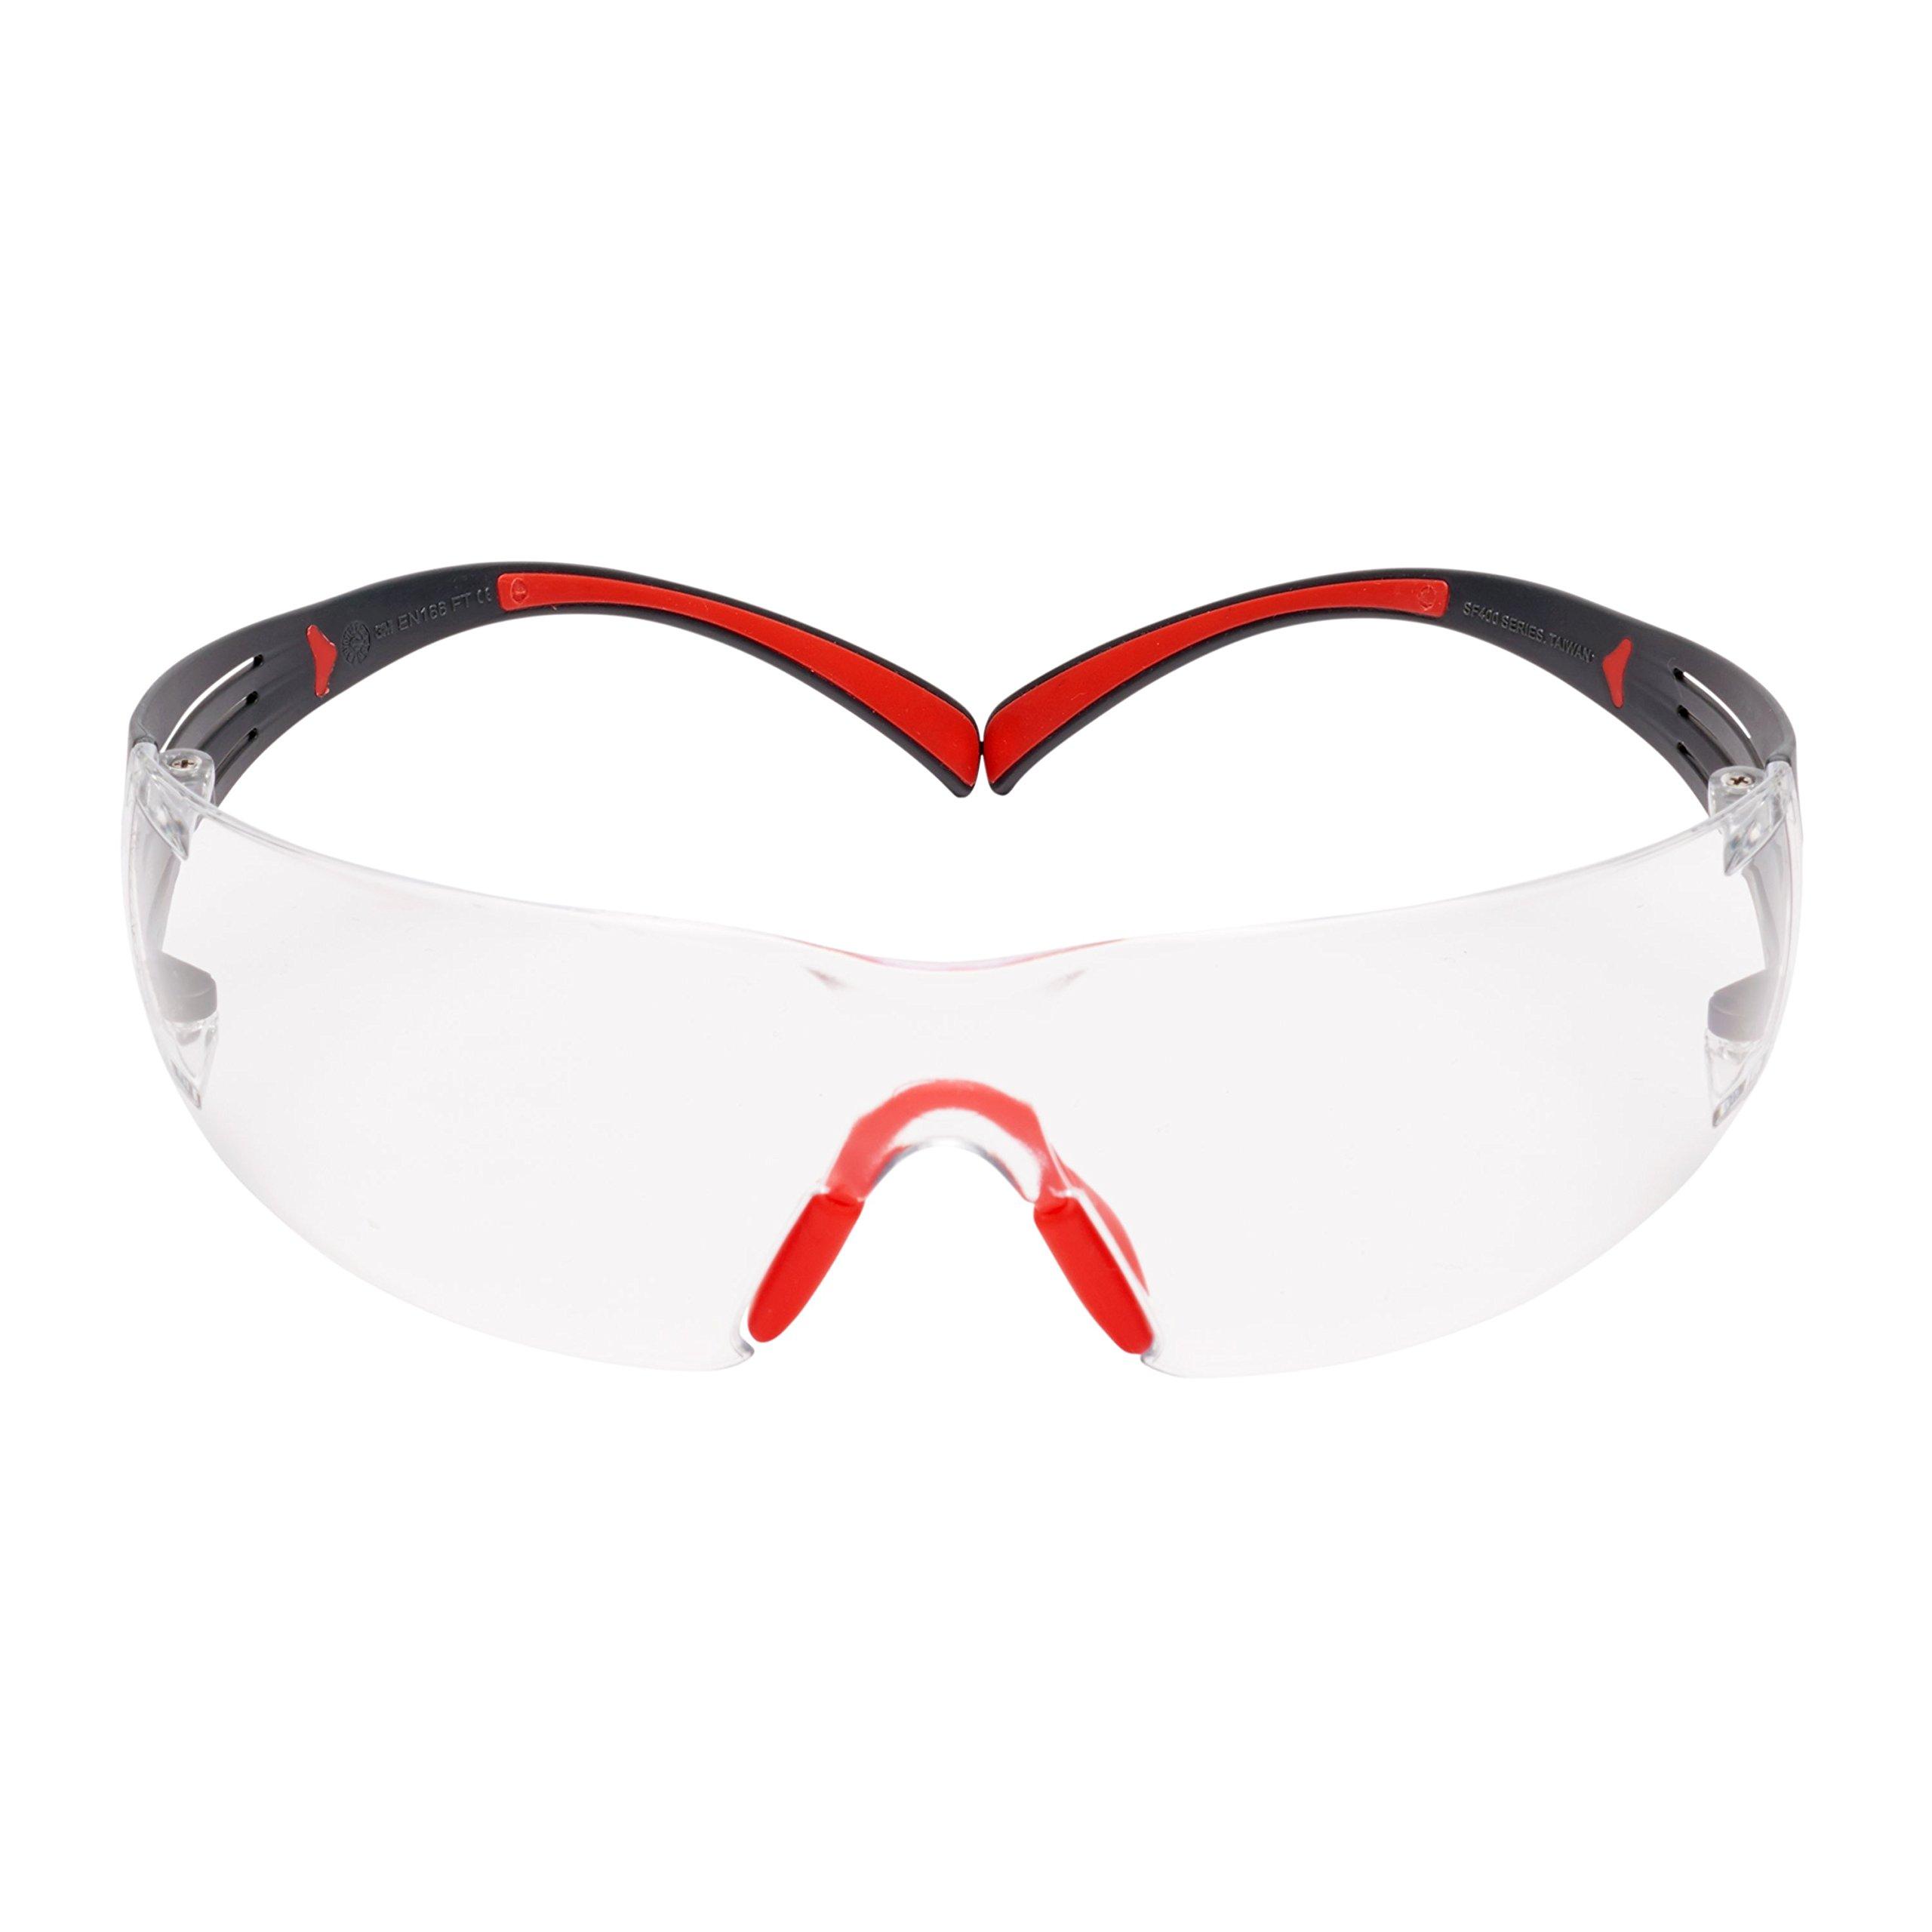 3M SecureFit 27715-case Clear Scotchgard Anti-Fog Lens, Plastic/Polycarbonate, Unisex, Red/Gray (Pack of 1000)